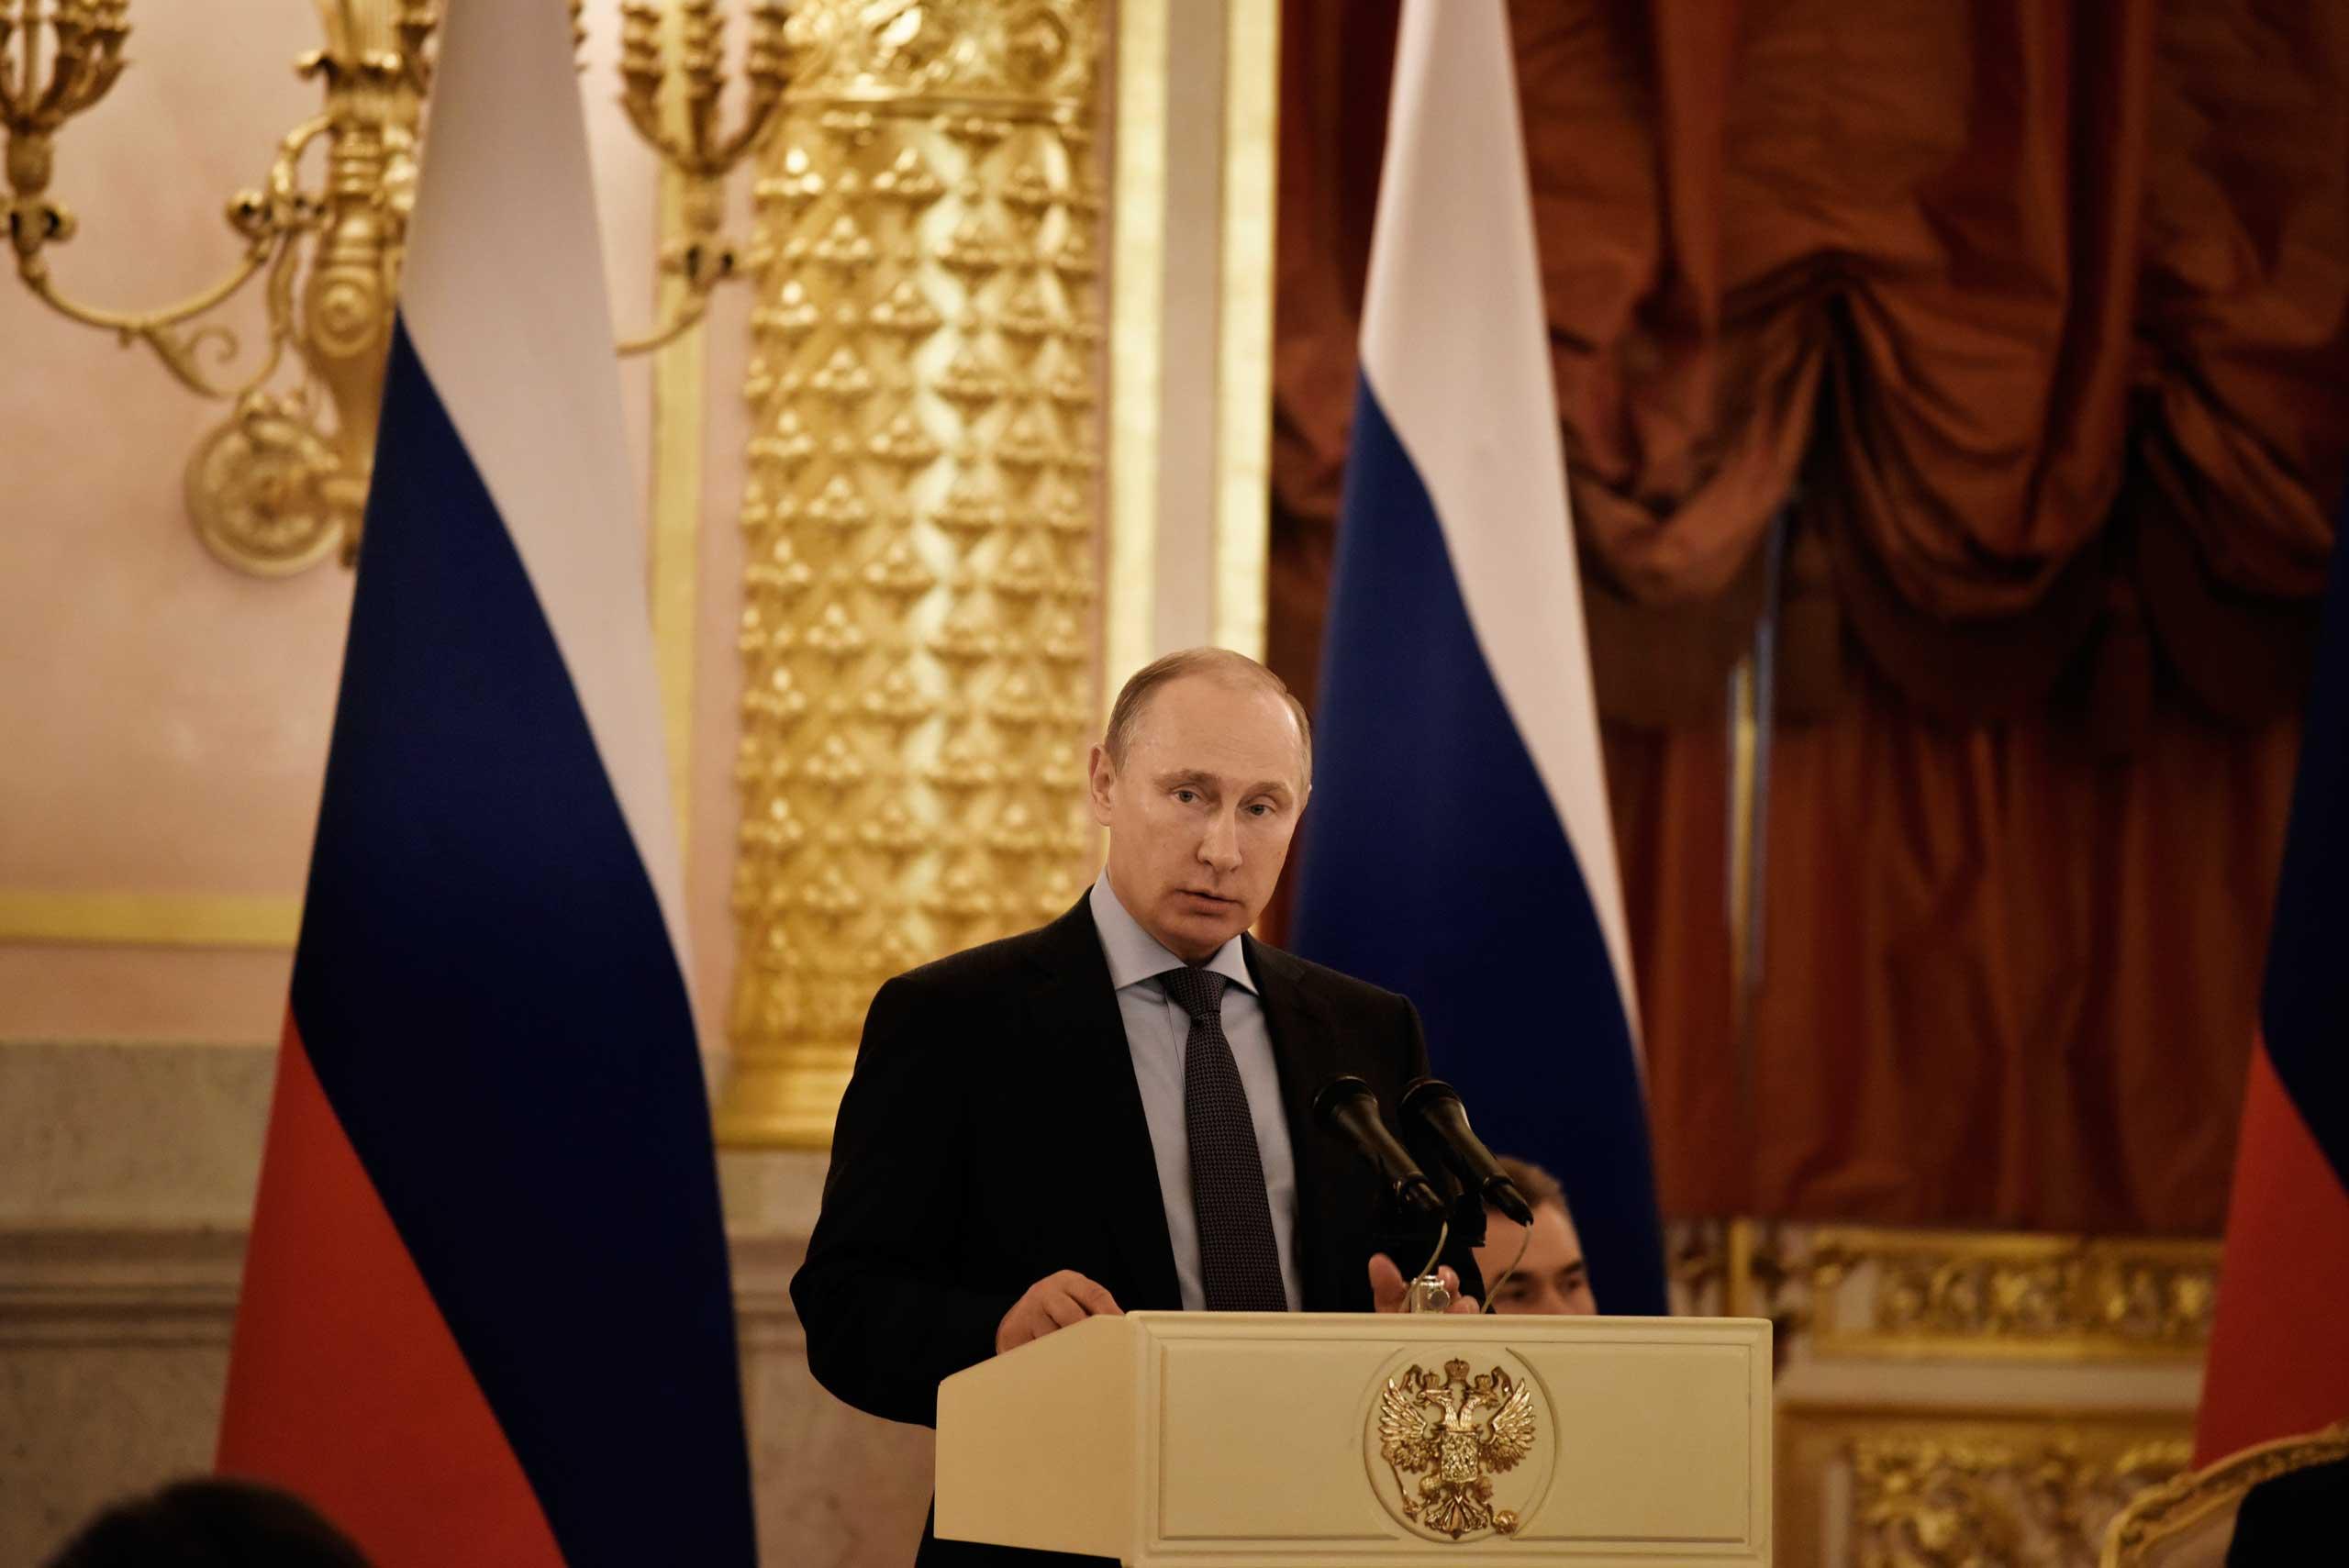 Russia President Vladimir Putin Cut Ukraine Criticism From Speech Time